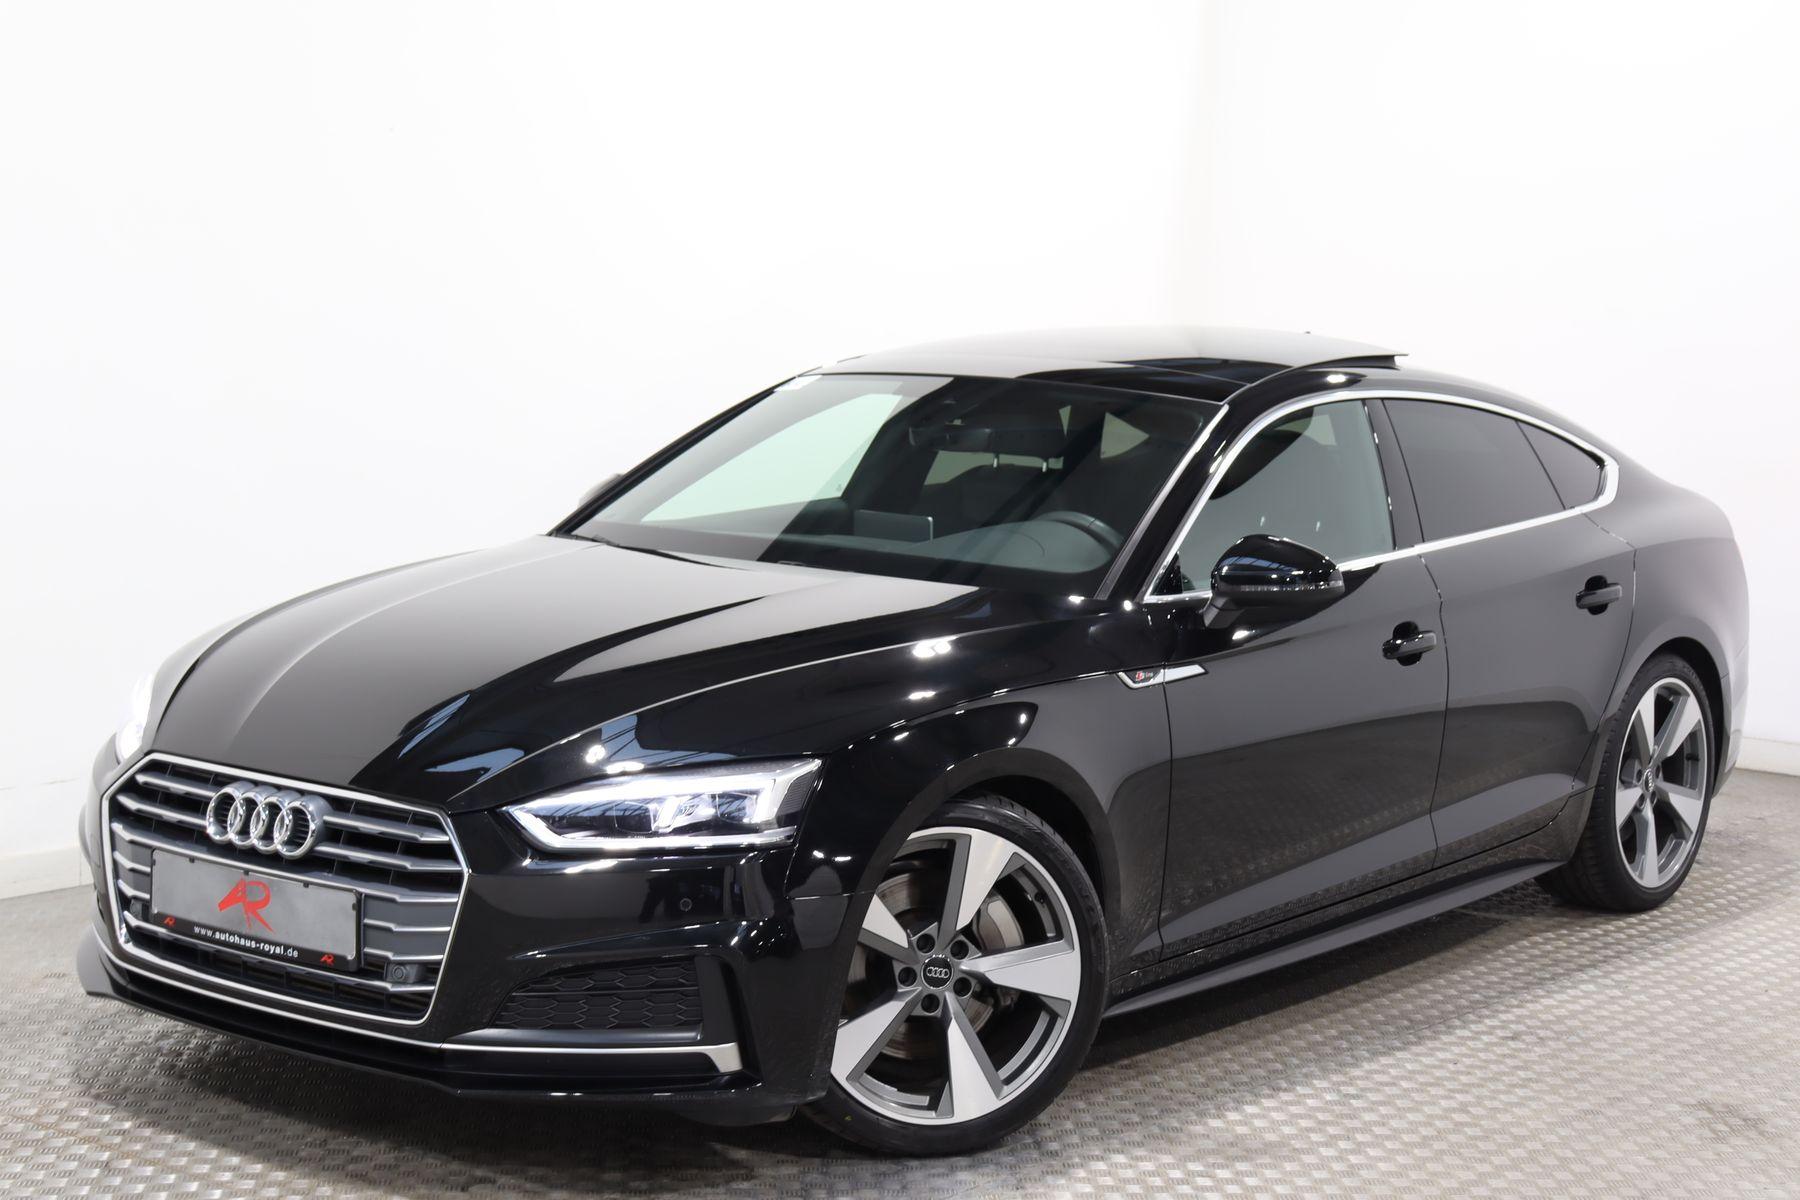 Audi A5 SB 2.0 TFSI 3x S LINE STANDHEIZ,KEYLESS,PANO, Jahr 2018, Benzin